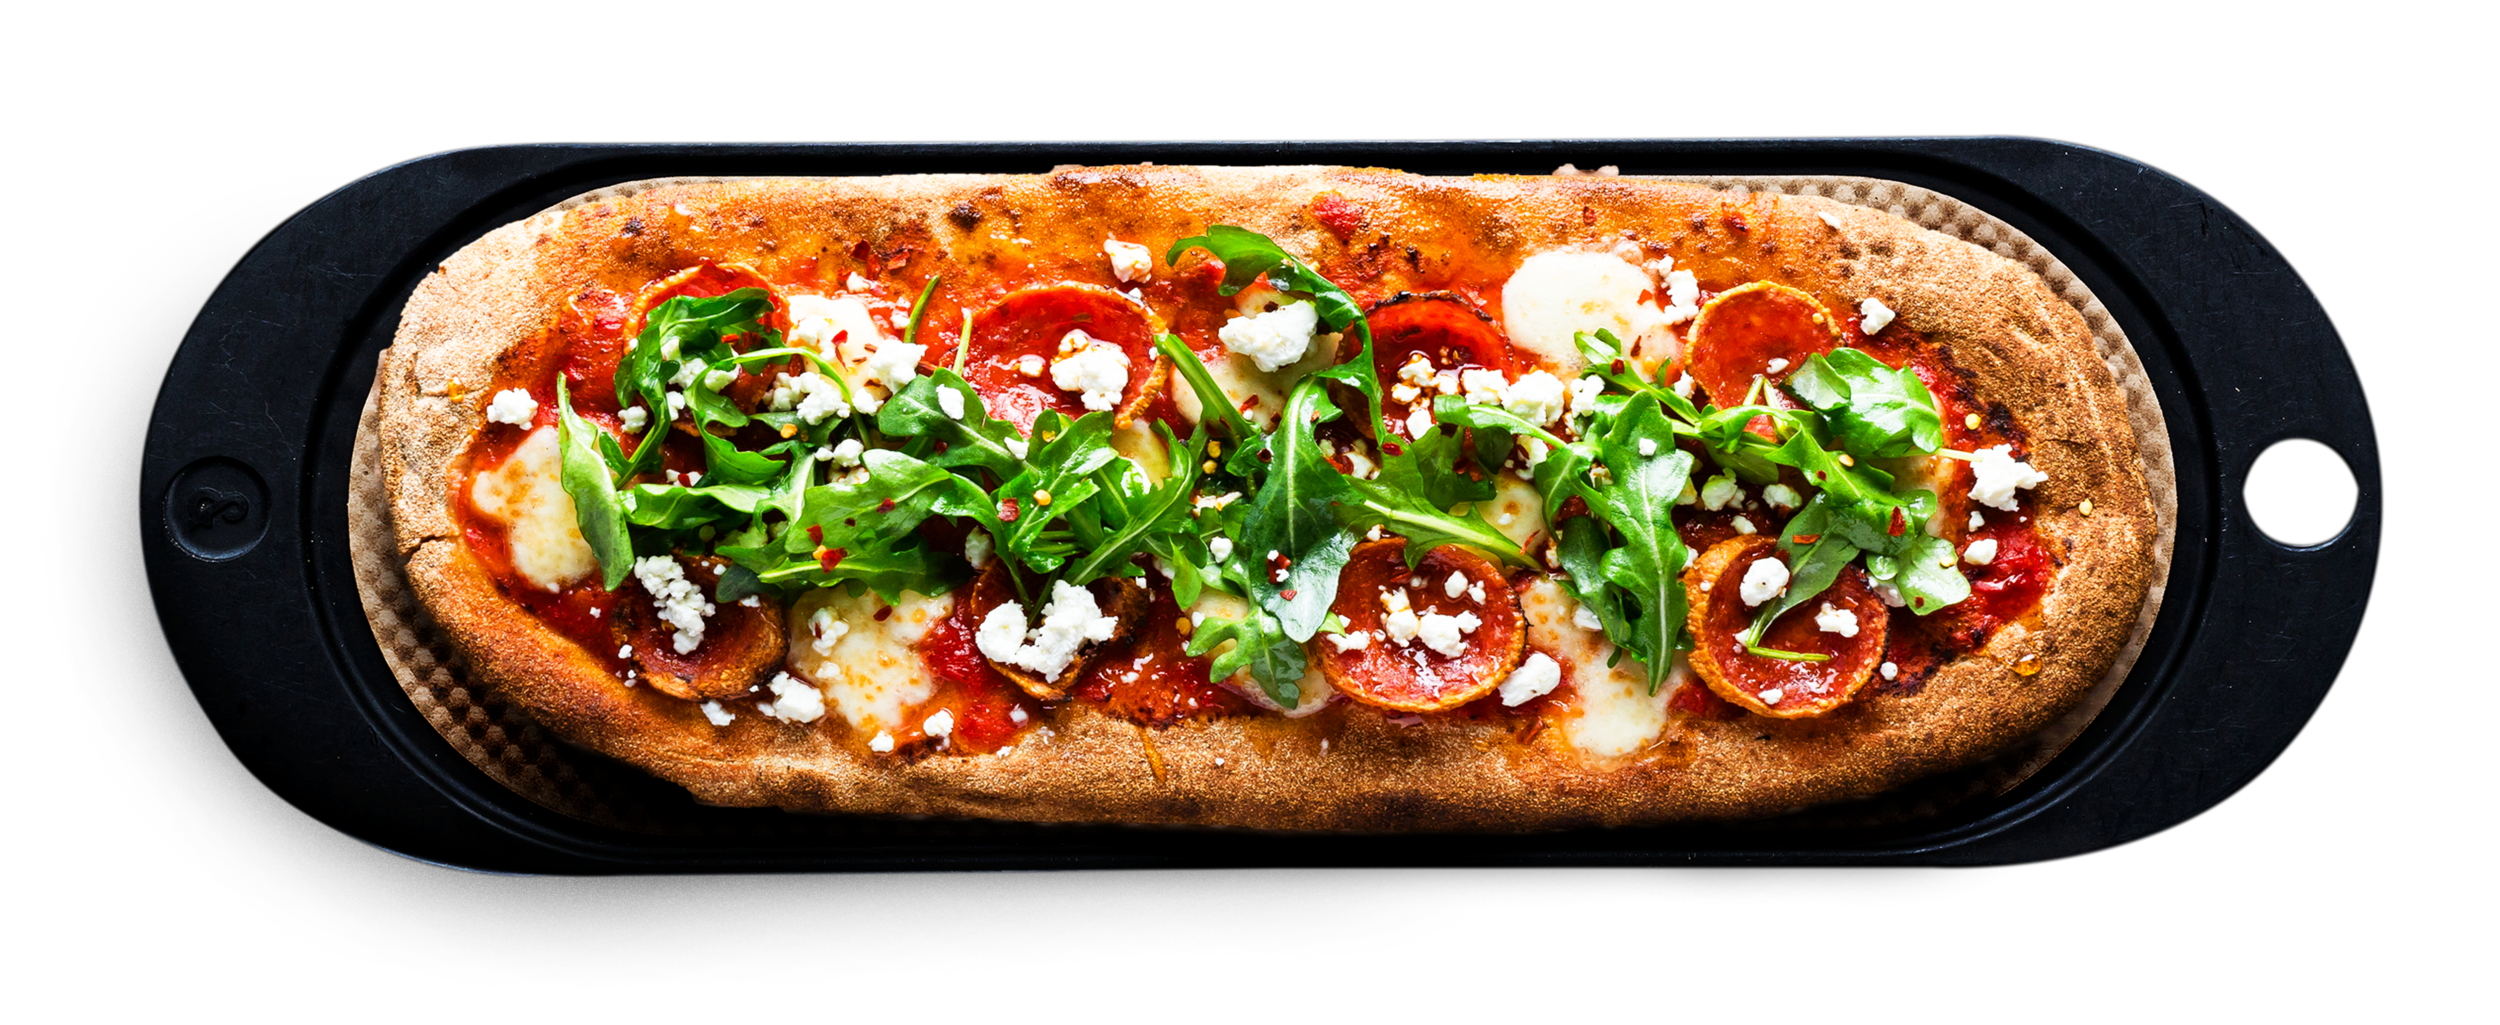 AMERICAN HONEY - Spicy tomato, fresh mozzarella, pepperoni, arugula, goat cheese, hot honey, red pepper flakes